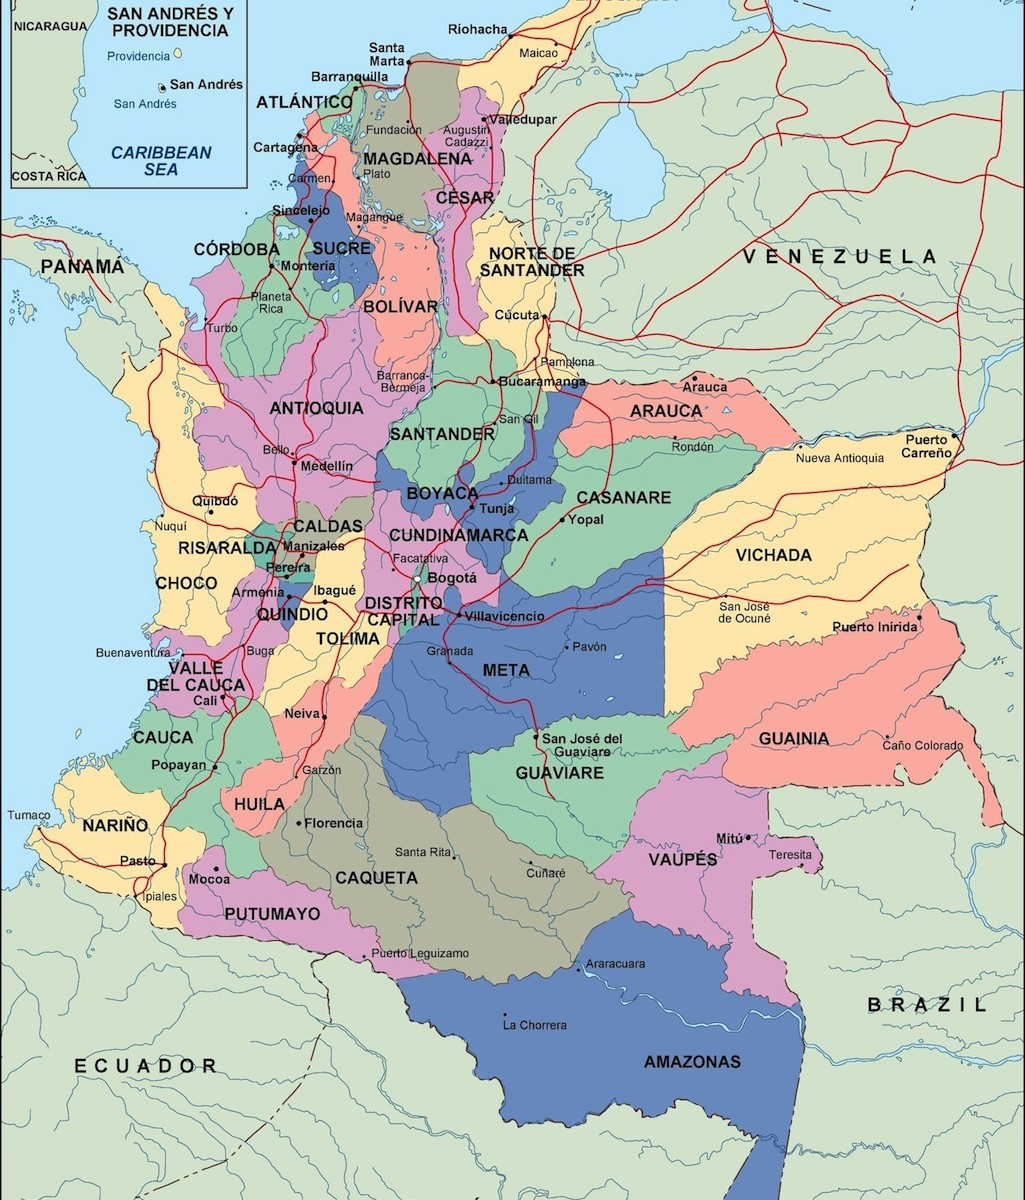 mapa politico de colombia 20174